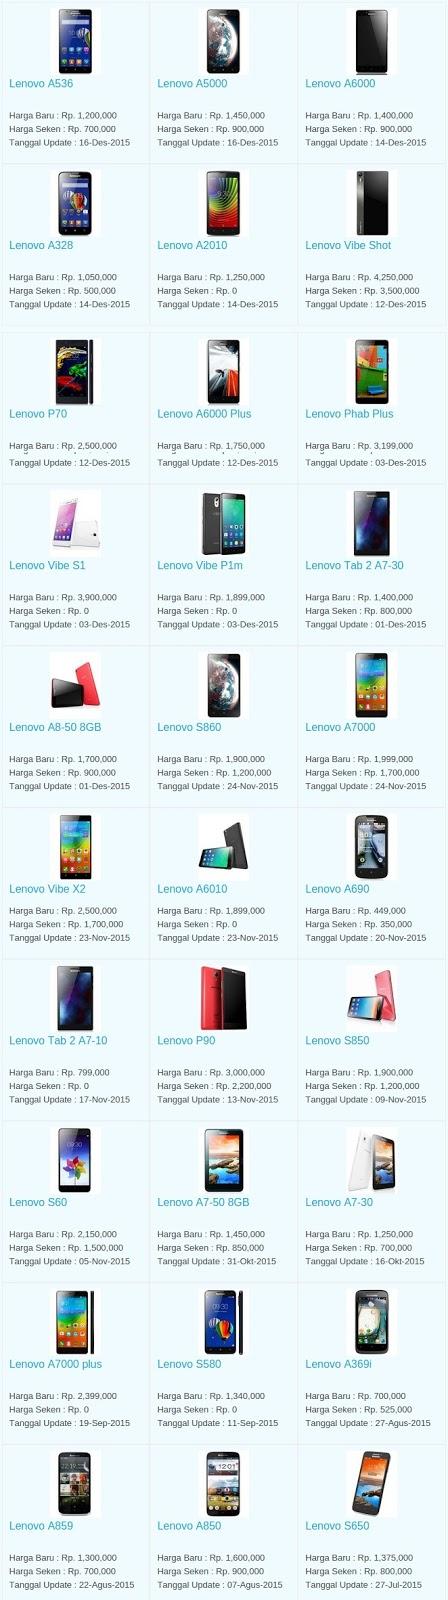 Daftar Harga Hp Lenovo Januari 2016